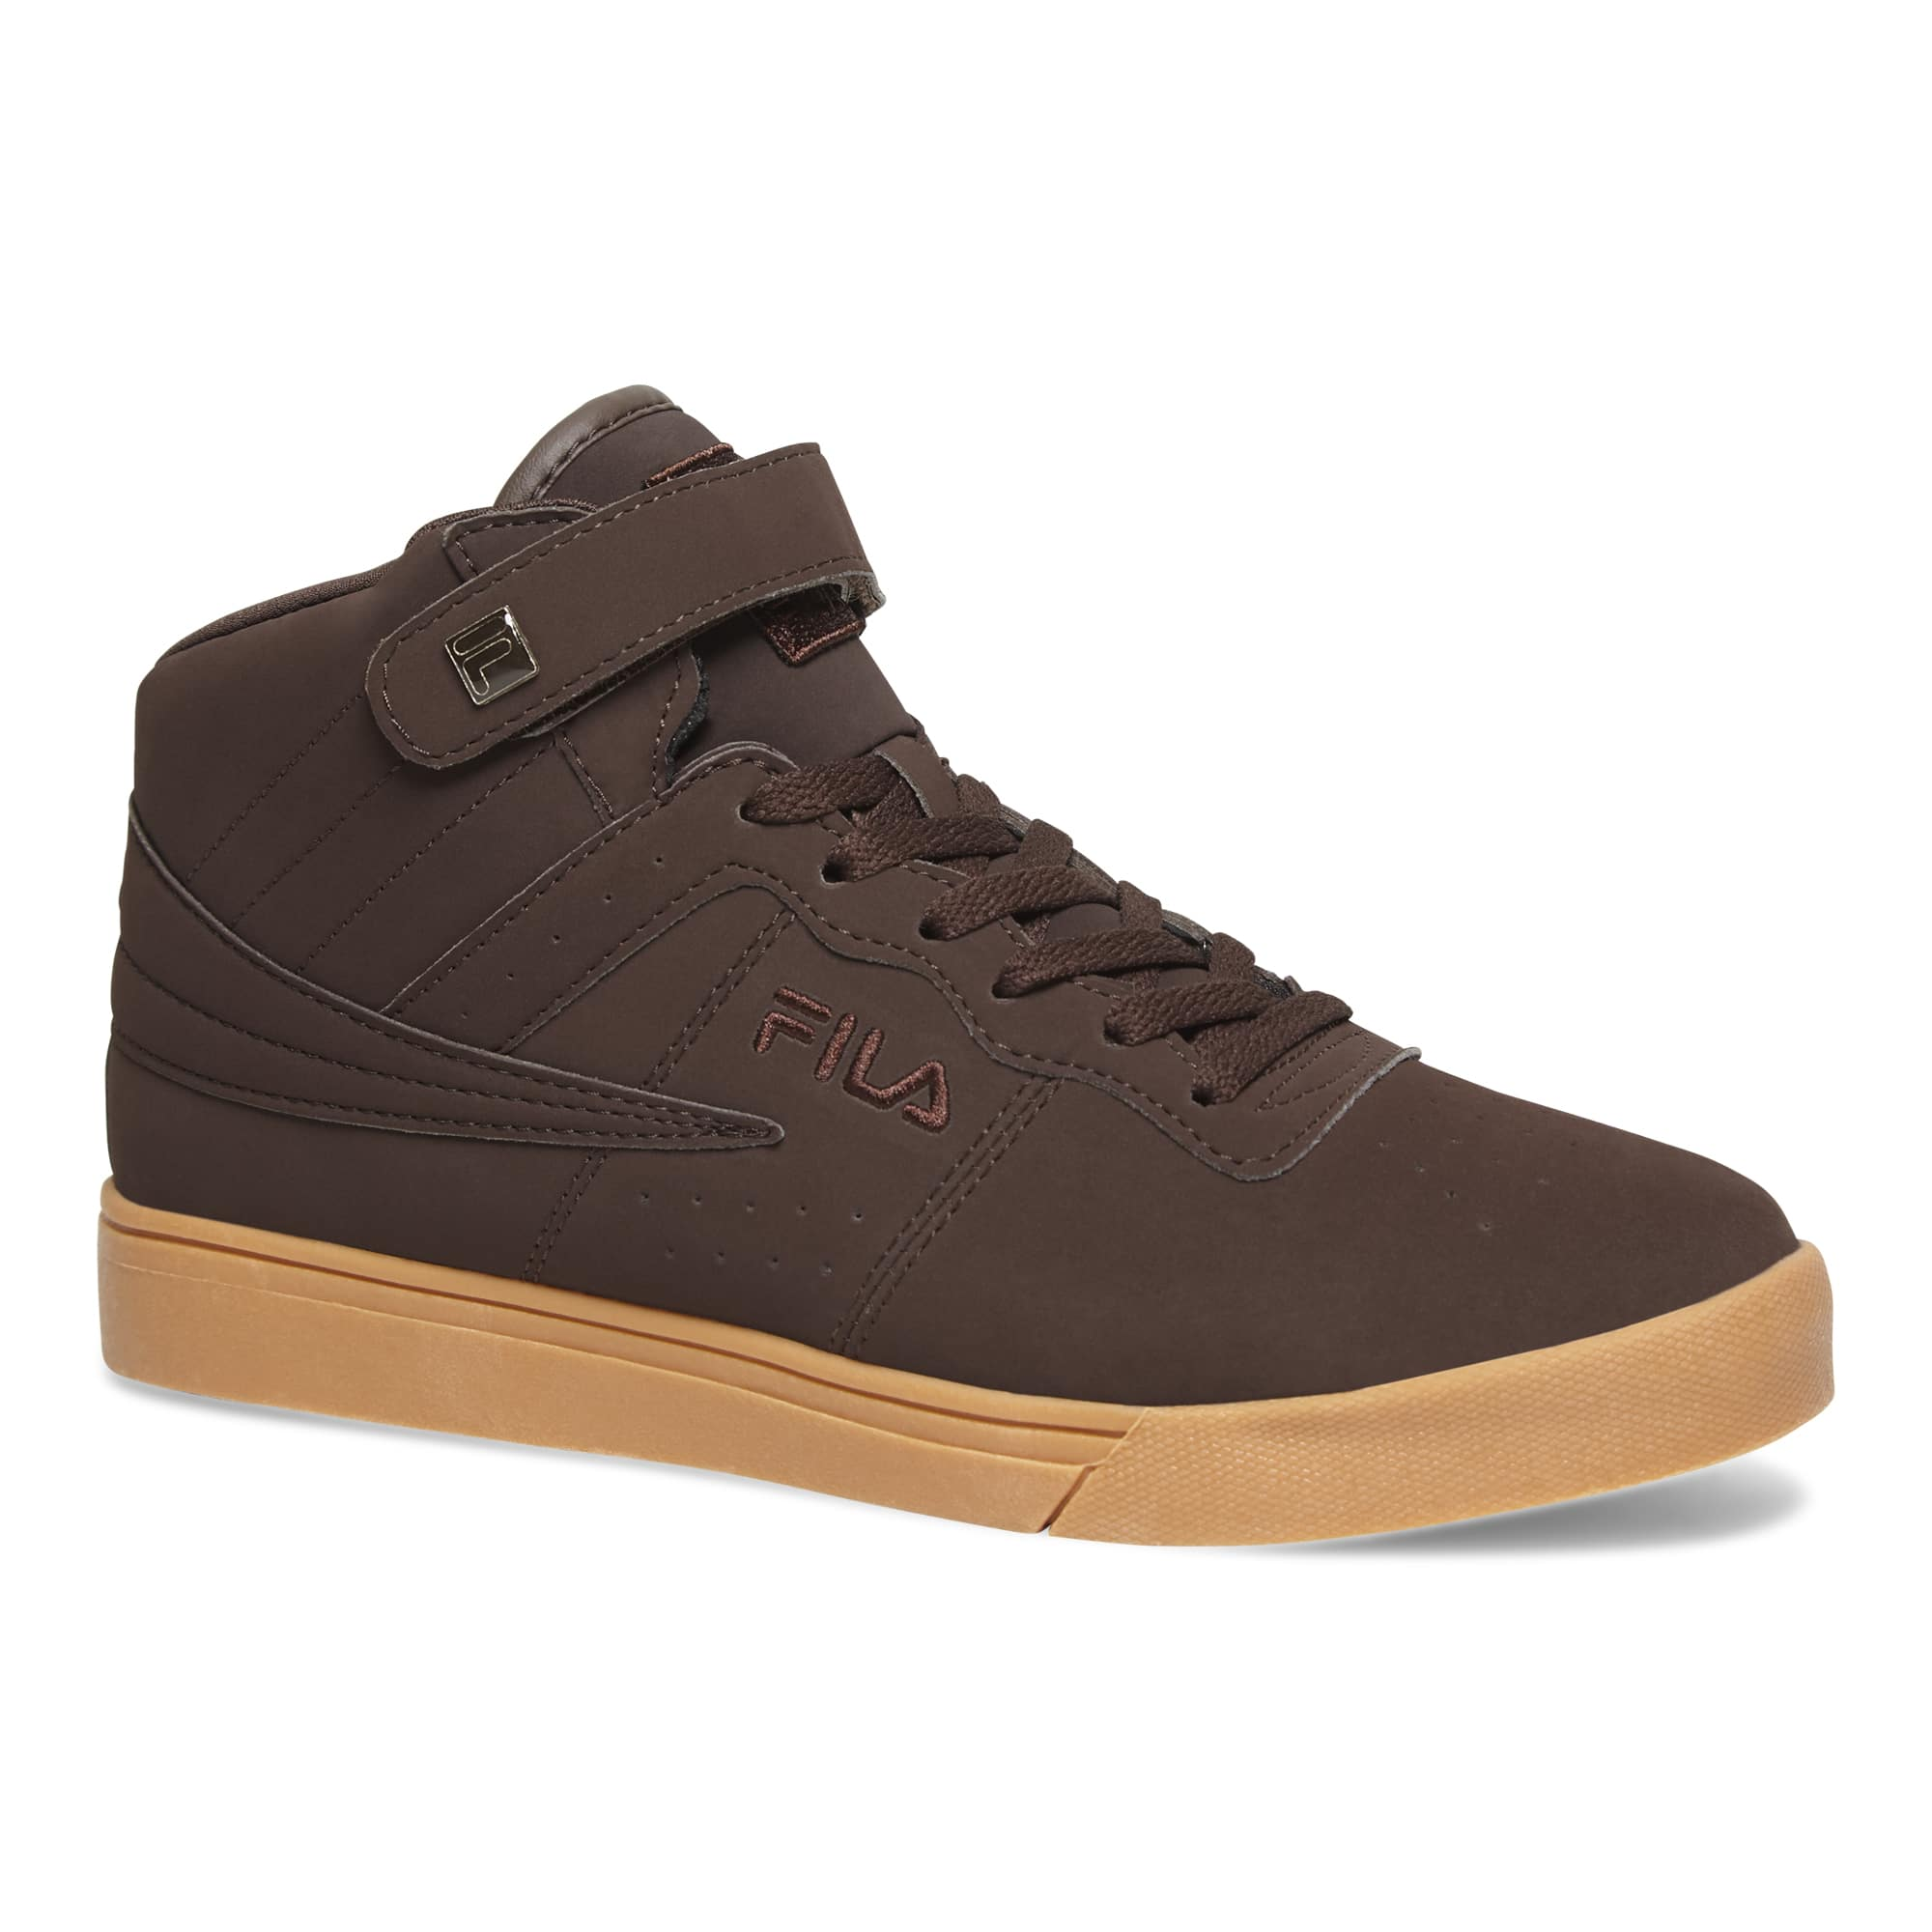 Fila ulc 13 MP Men's Sneaker - $19.99 + FS